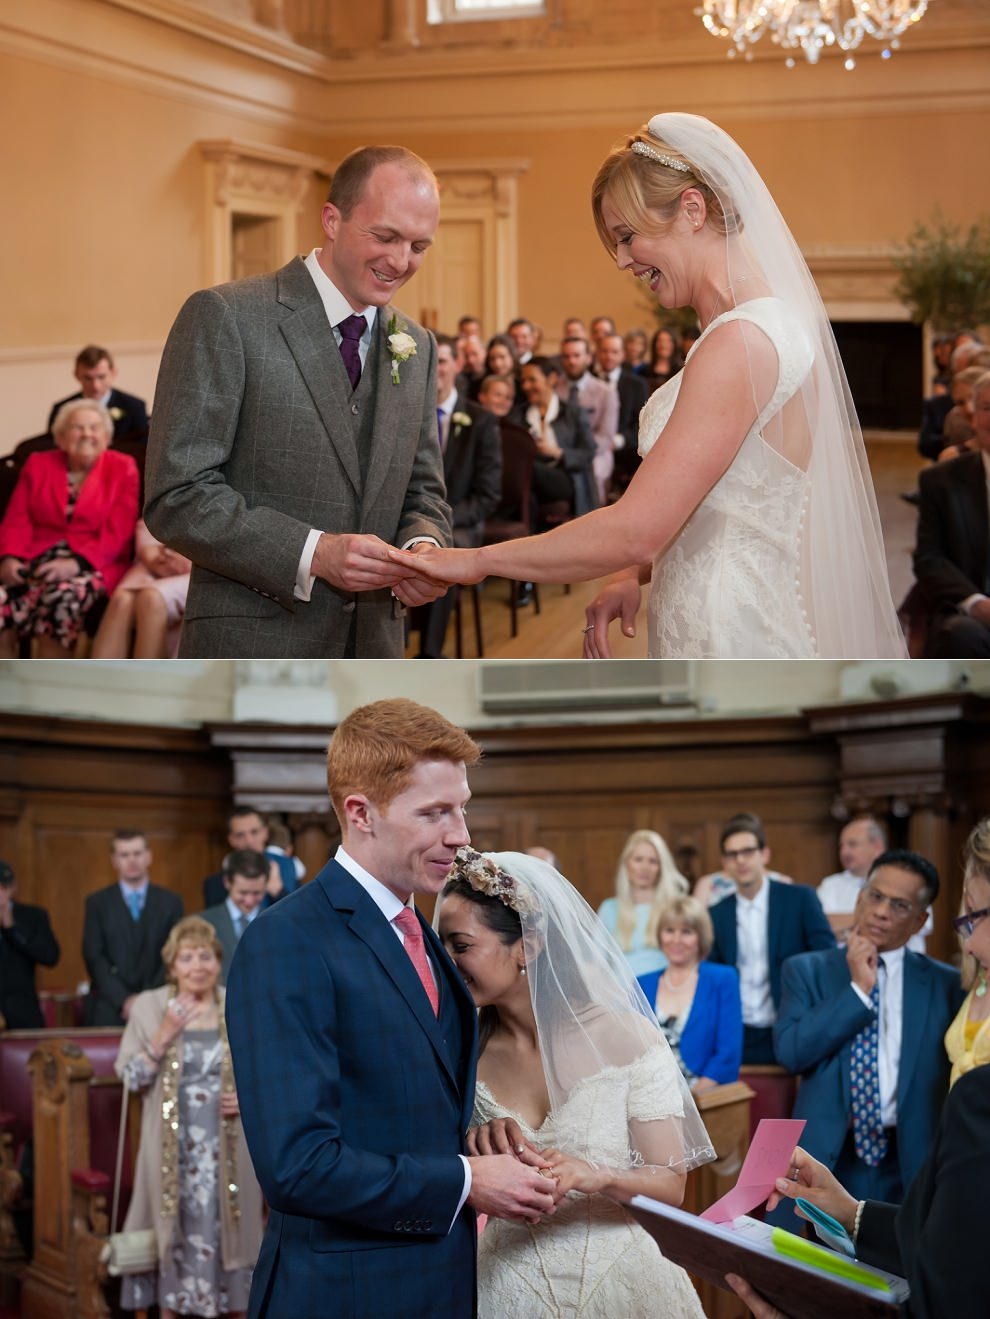 Best-wedding-photos-UK-2015-069